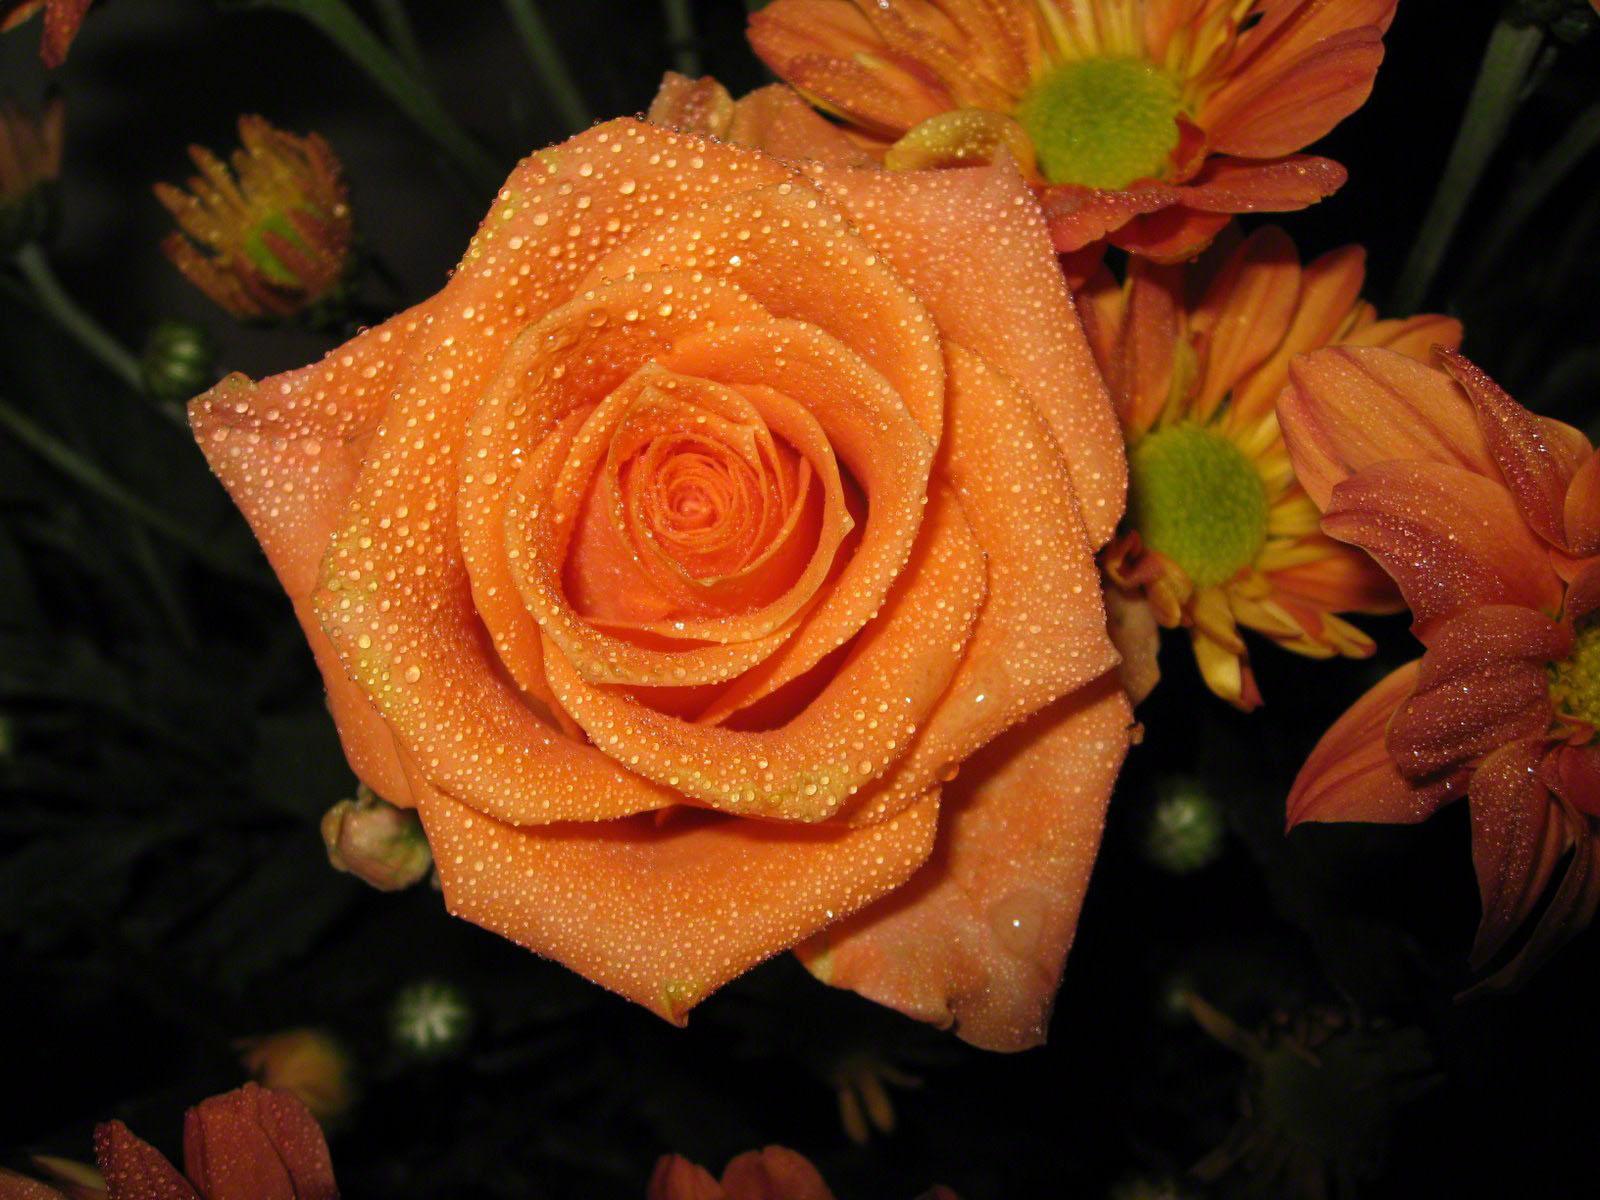 http://www.fabiovisentin.com/photography/photo/12/roses-wallpaper-roses-bouquets4400.jpg